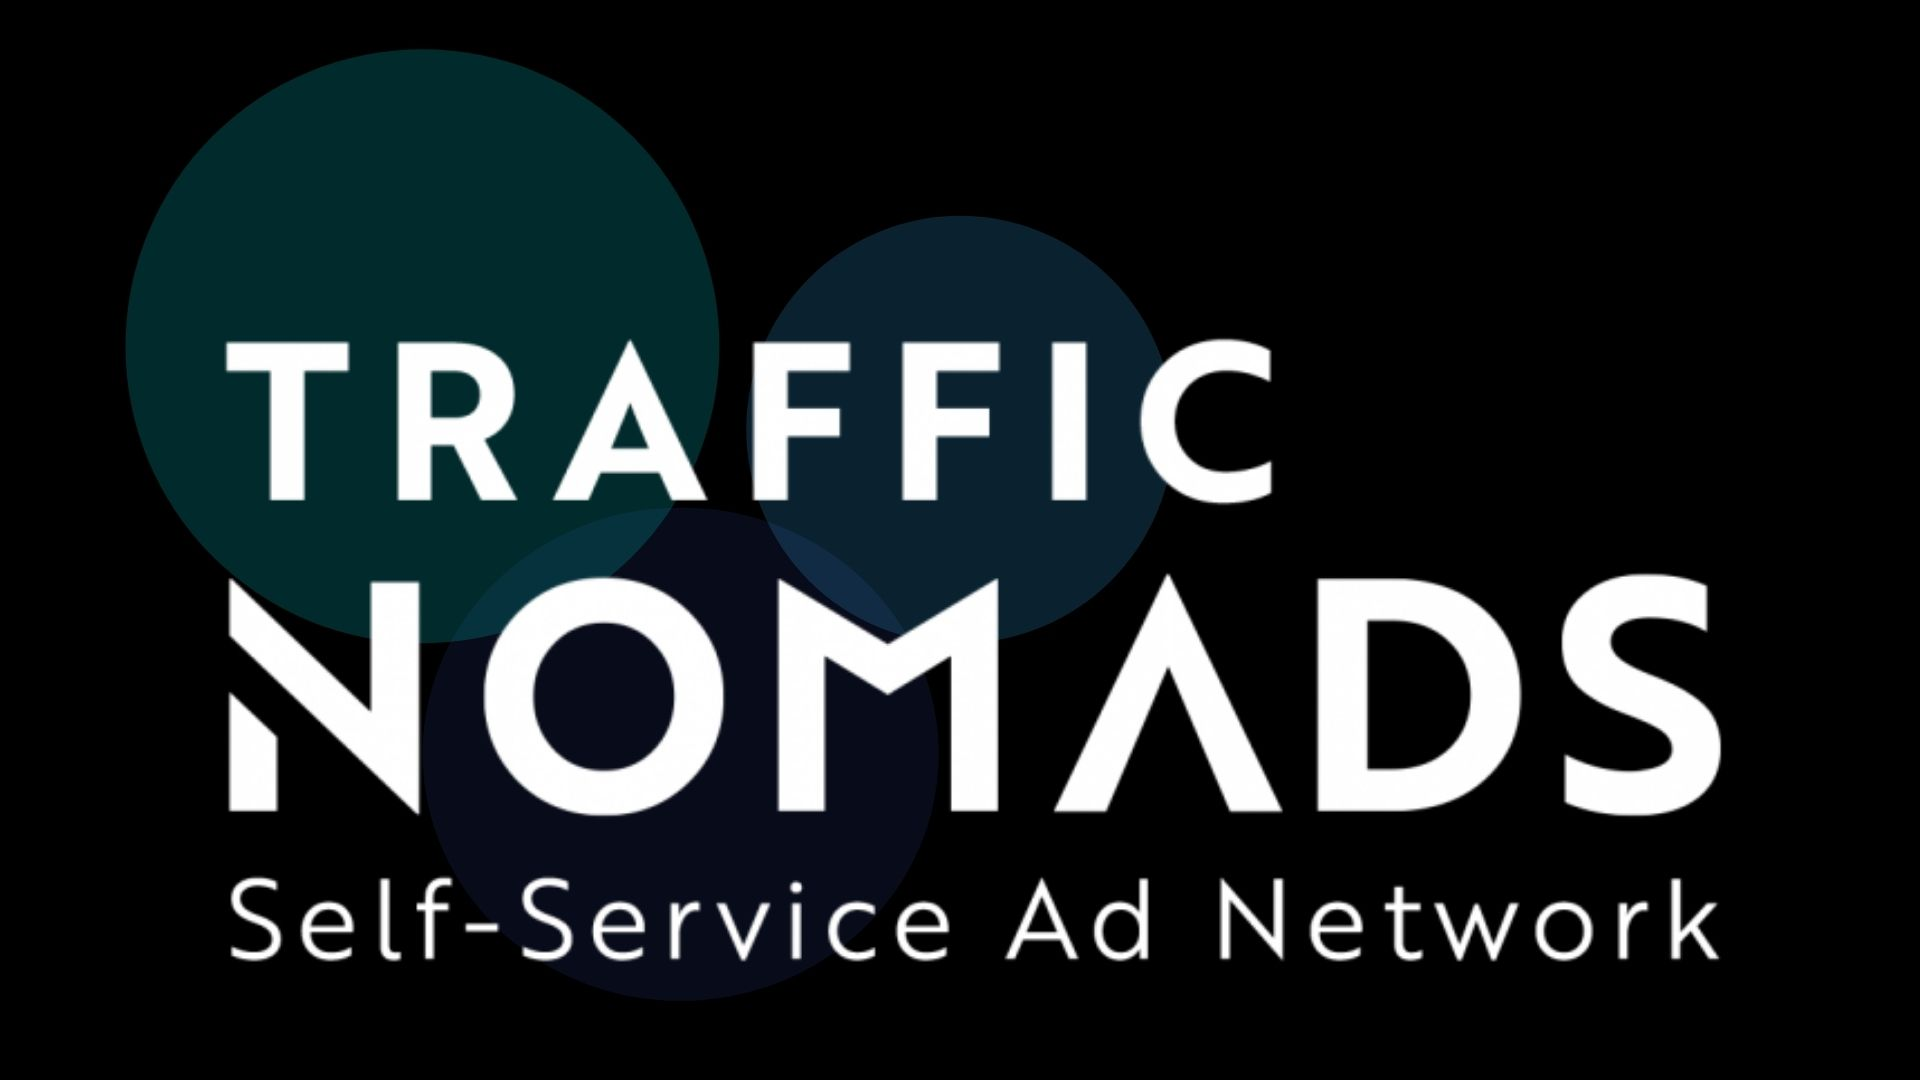 TrafficNomads